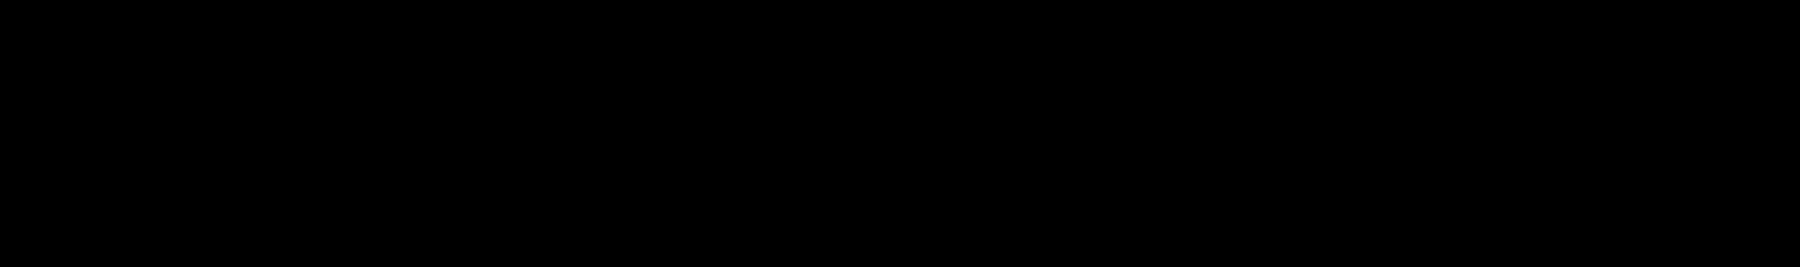 License Management Service for IBM Watson Health logo